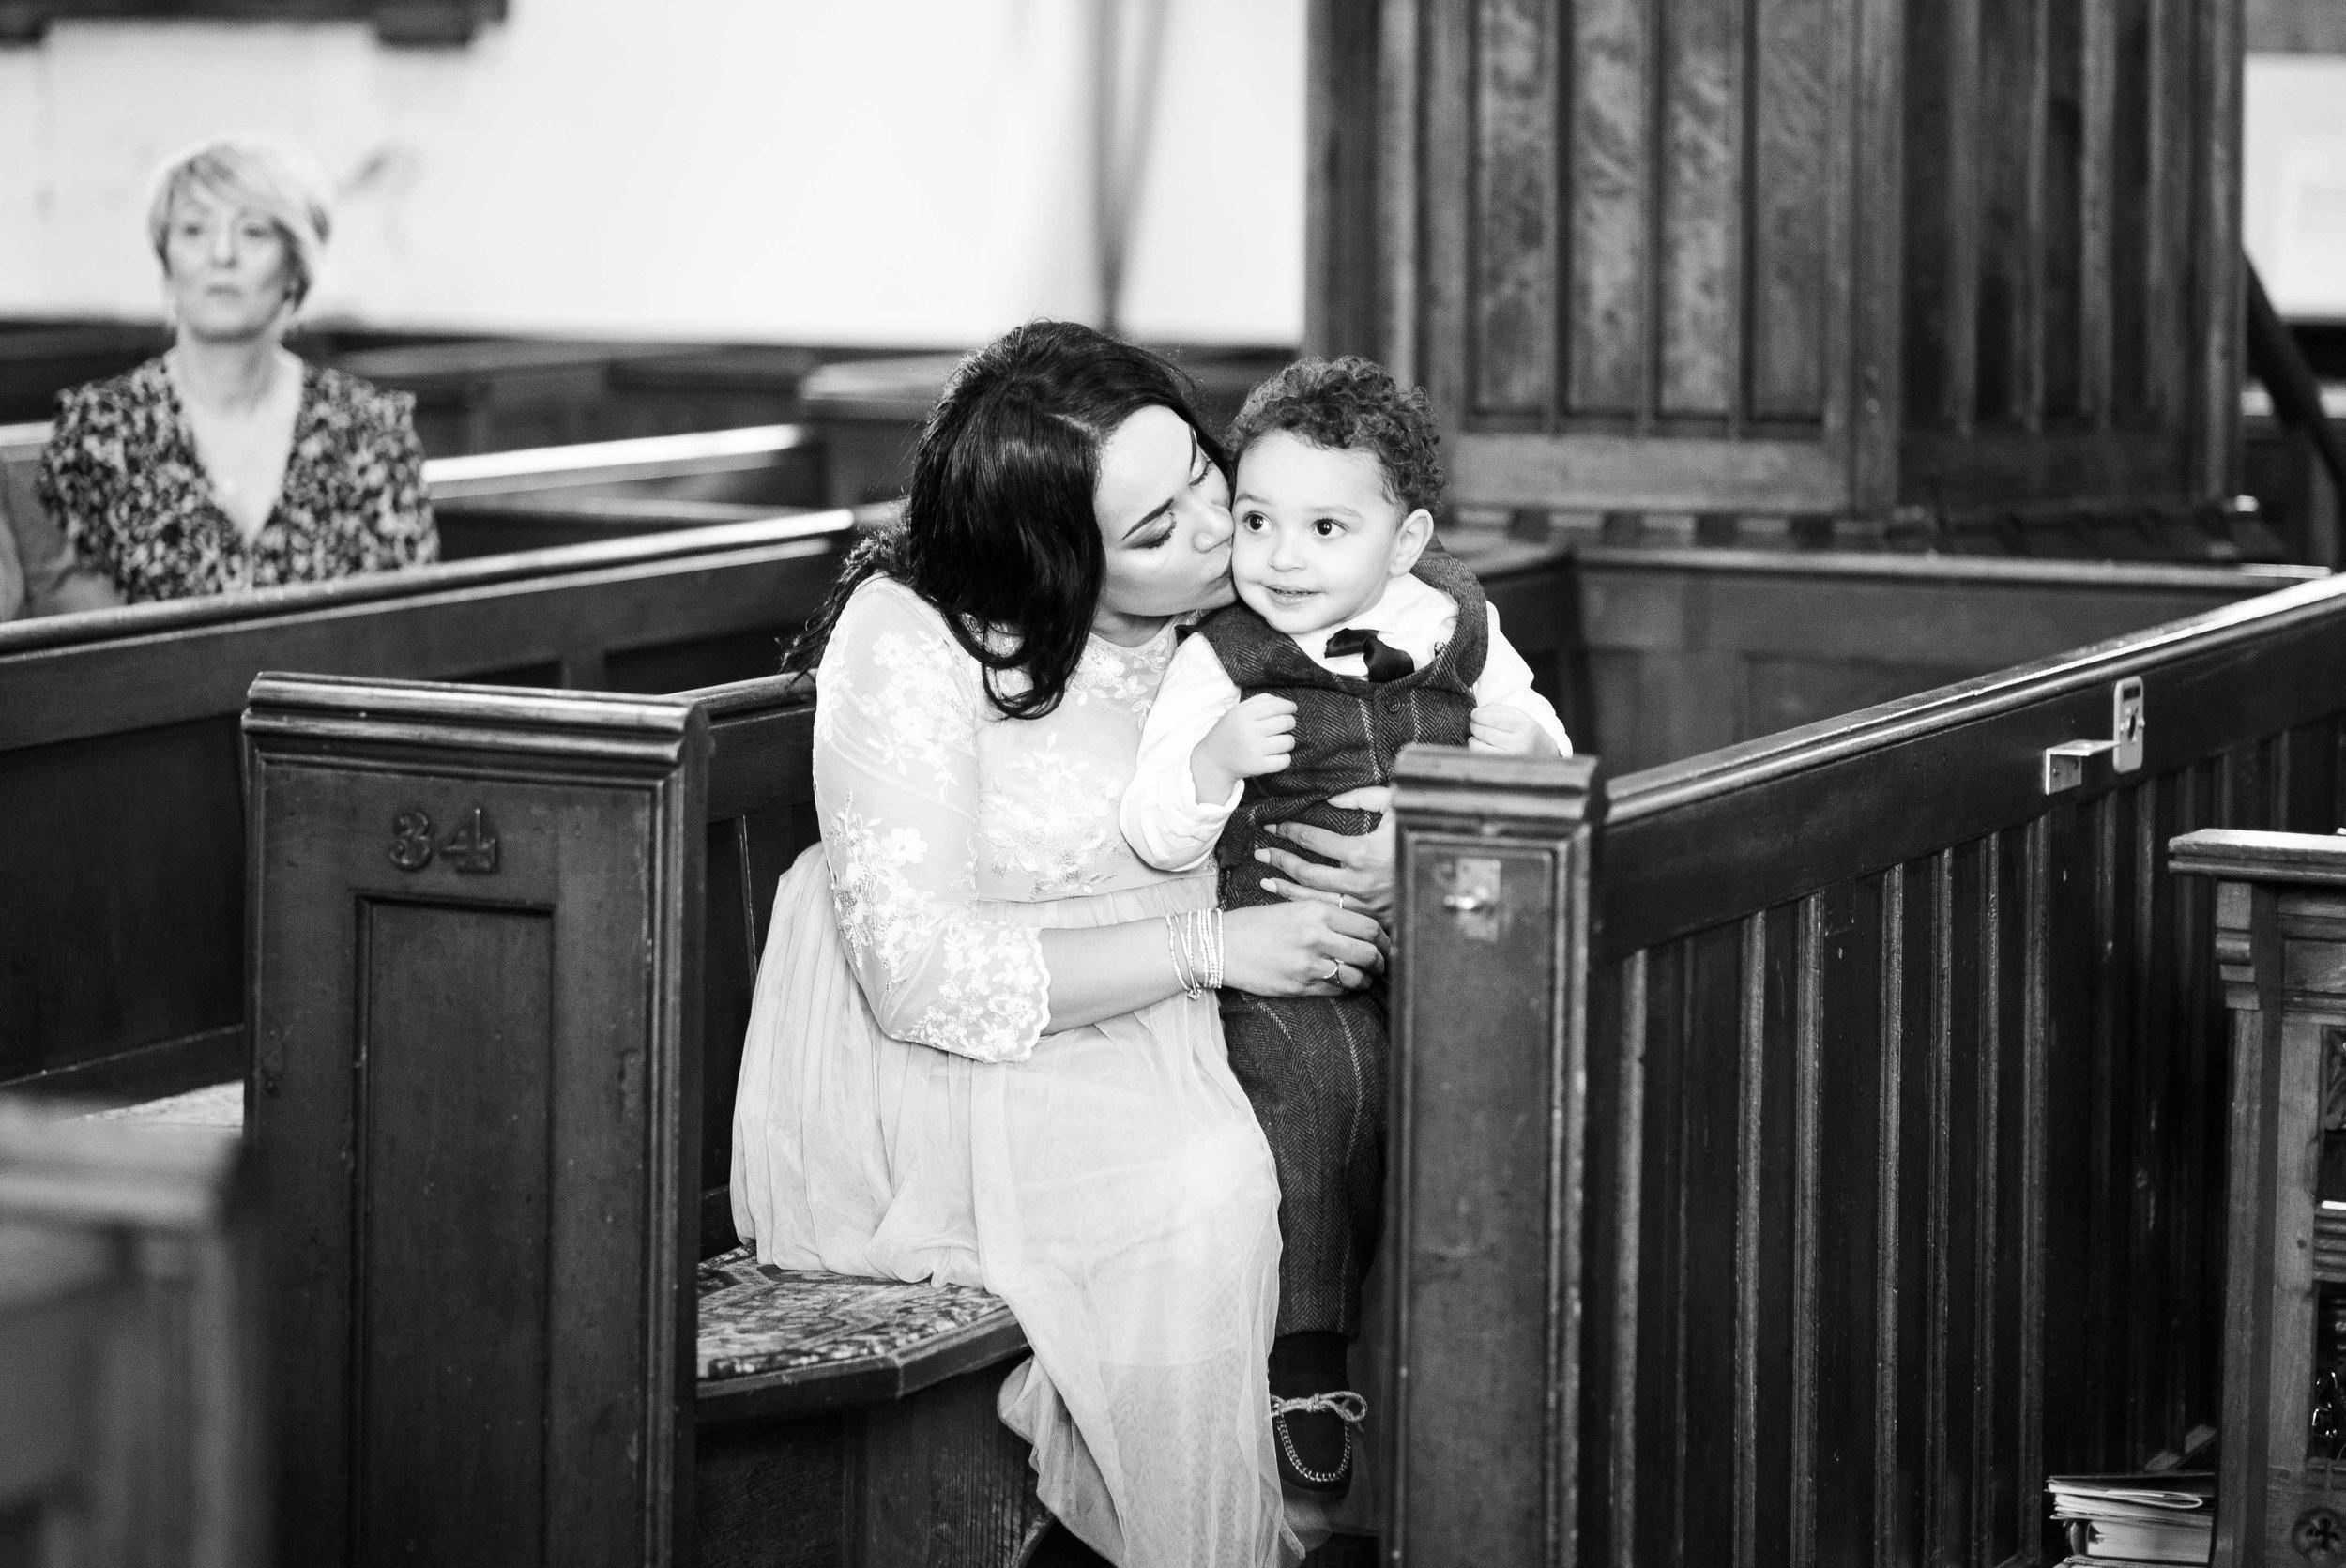 Lea-cooper-photography-christening-photographer-baptism-wolverhampton-wednesbury-walsall-willenhall-dudley-church-chapel-event-photography-6.jpg